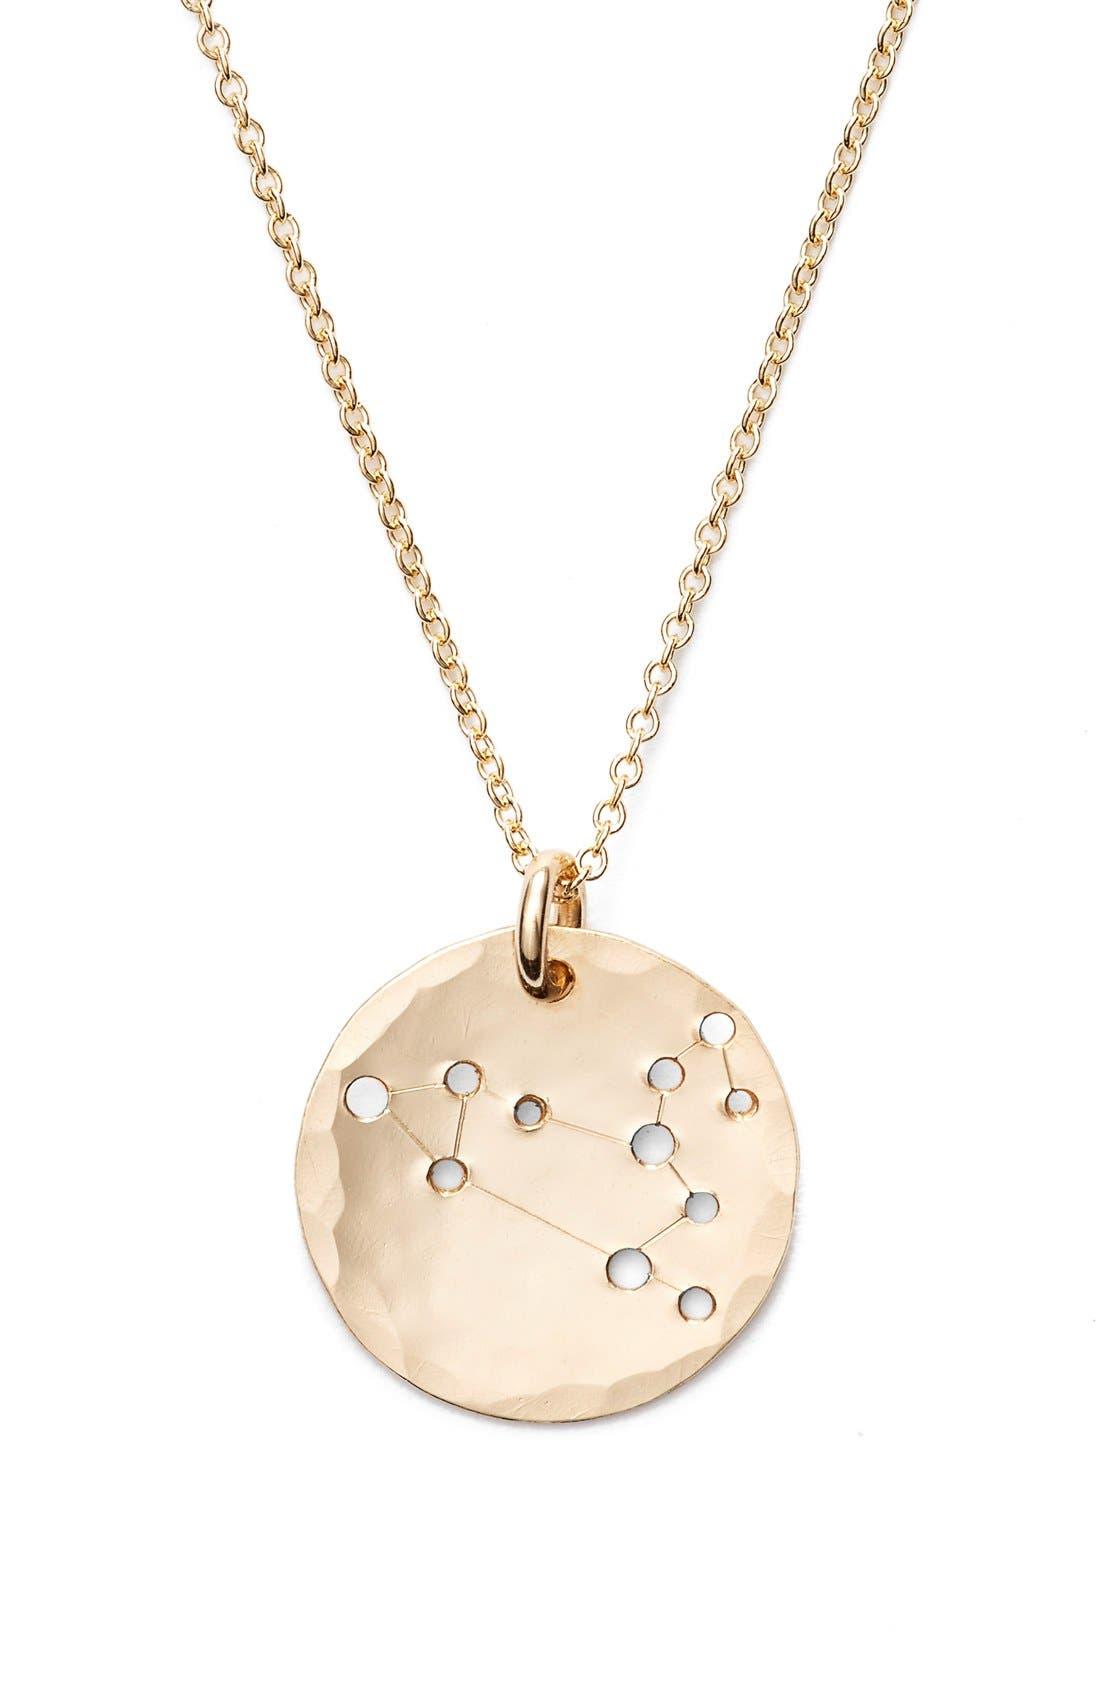 Ija 'Small Zodiac' 14k-Gold Fill Necklace,                             Alternate thumbnail 17, color,